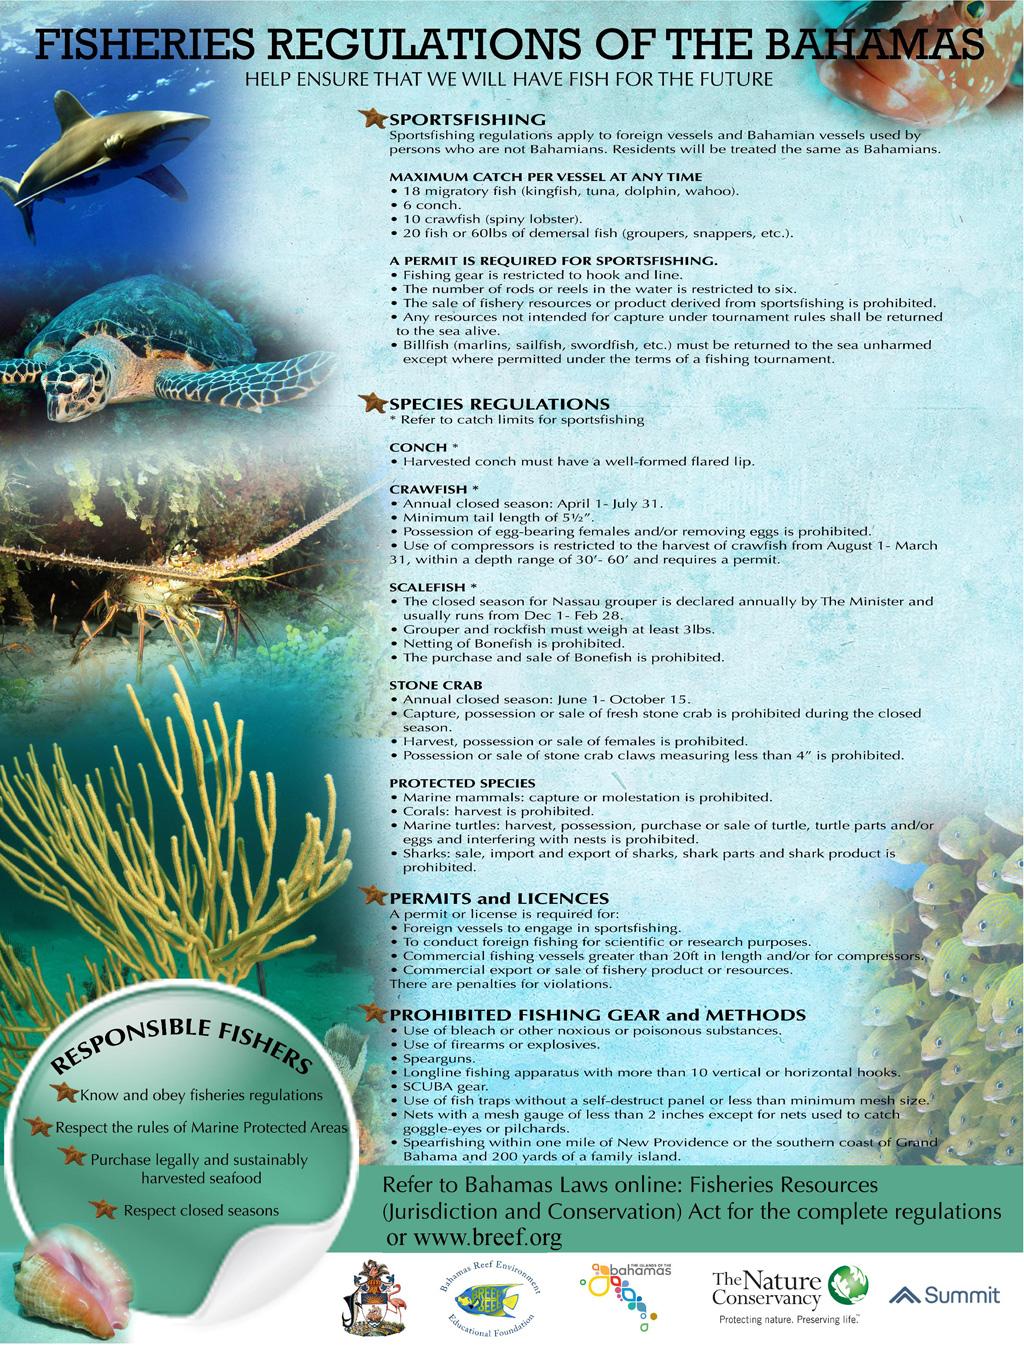 Fisheries-Regulations-Bahamas-Poster